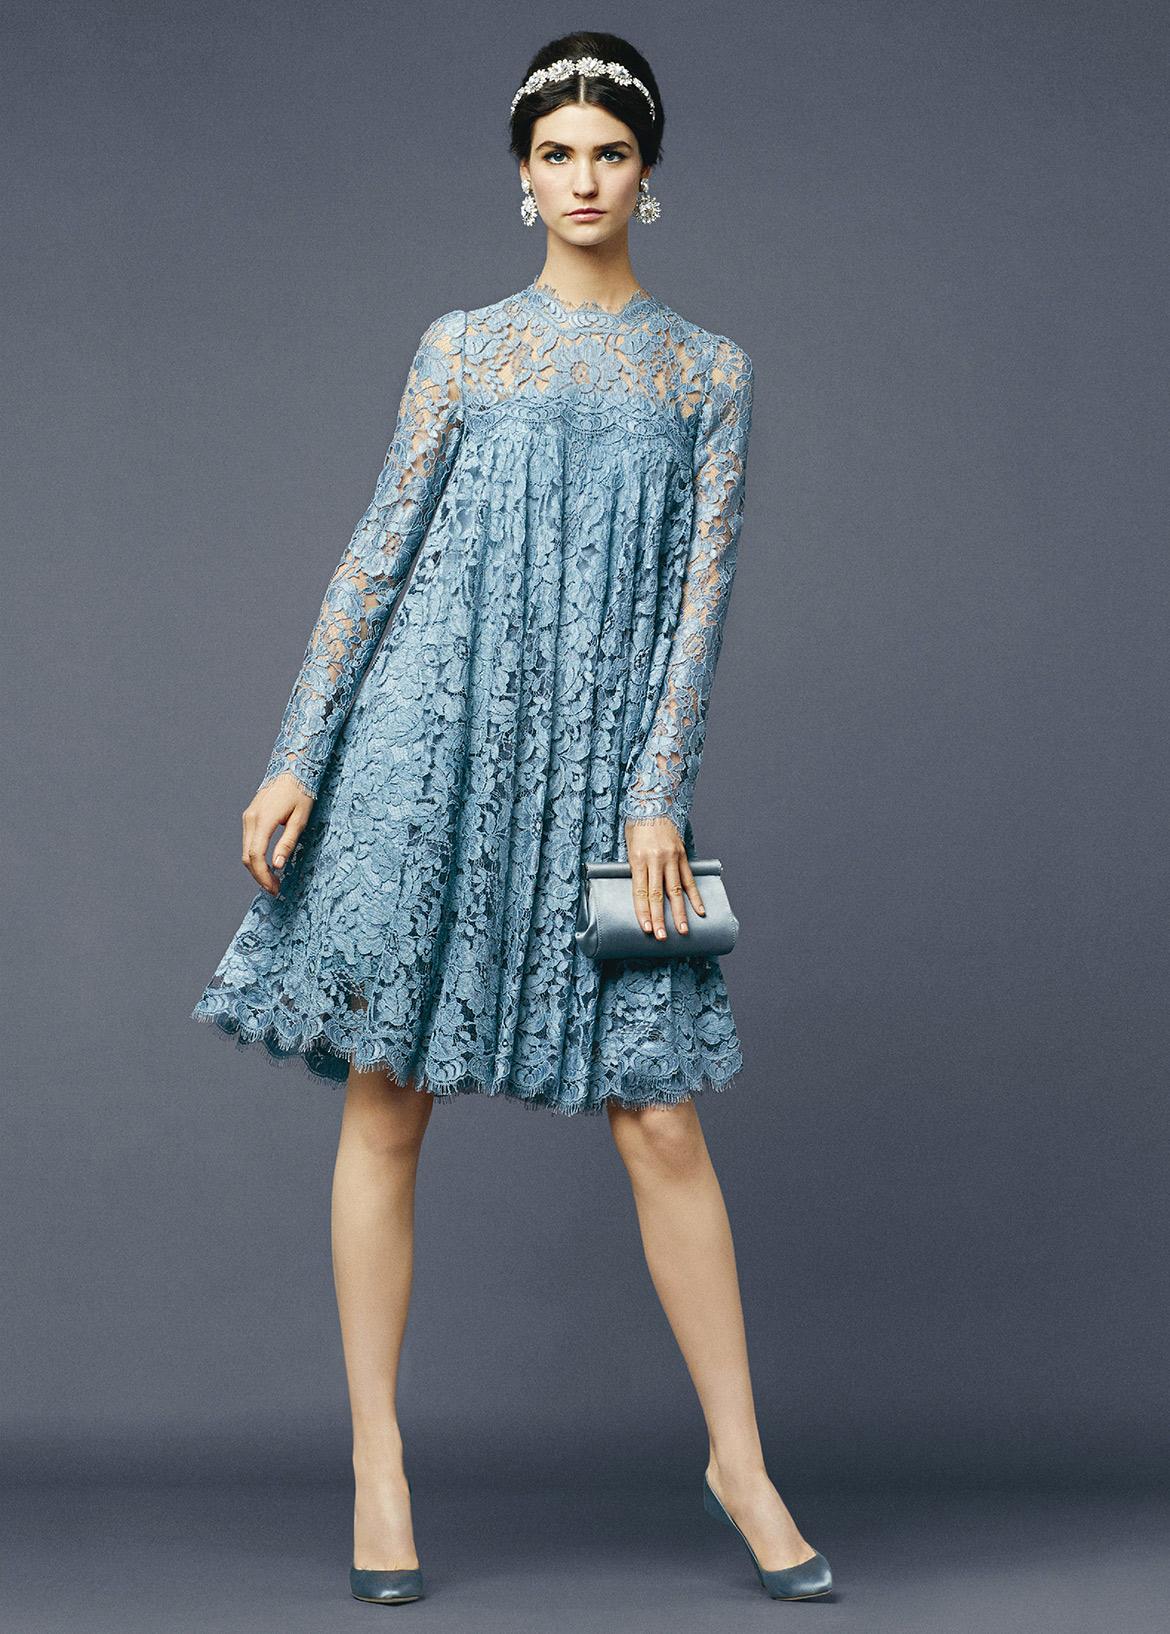 Dolce e Gabbana idee fashion wedding abiti sposa9 ... 0e894d12688